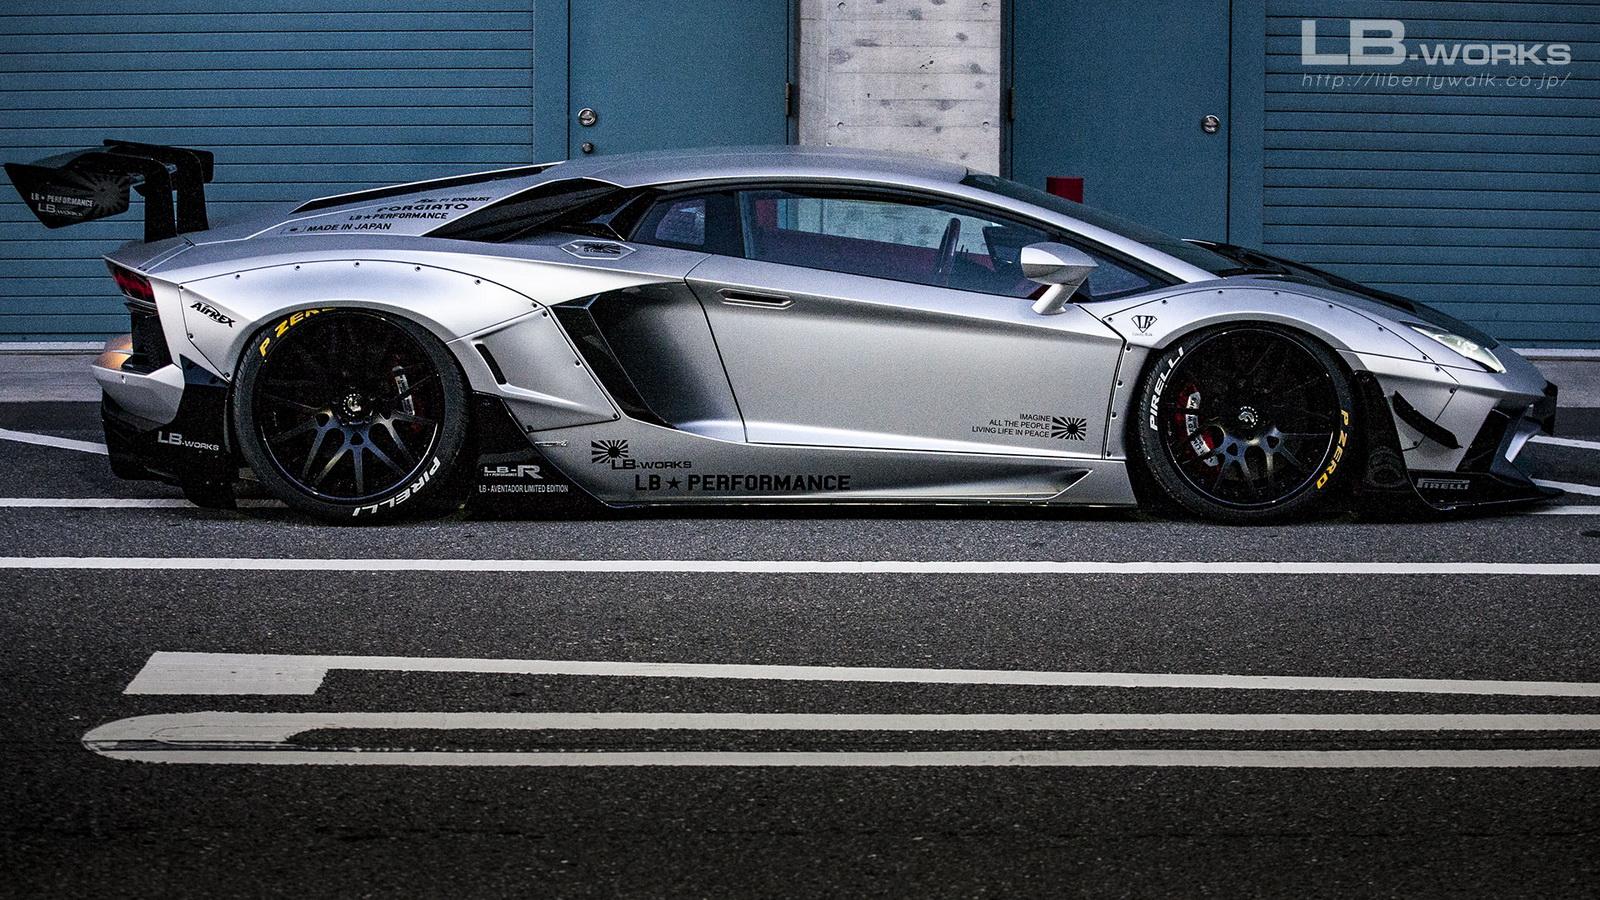 Galeri Gambar Modifikasi Mobil Lamborghini Aventador Dunia Ottomotif